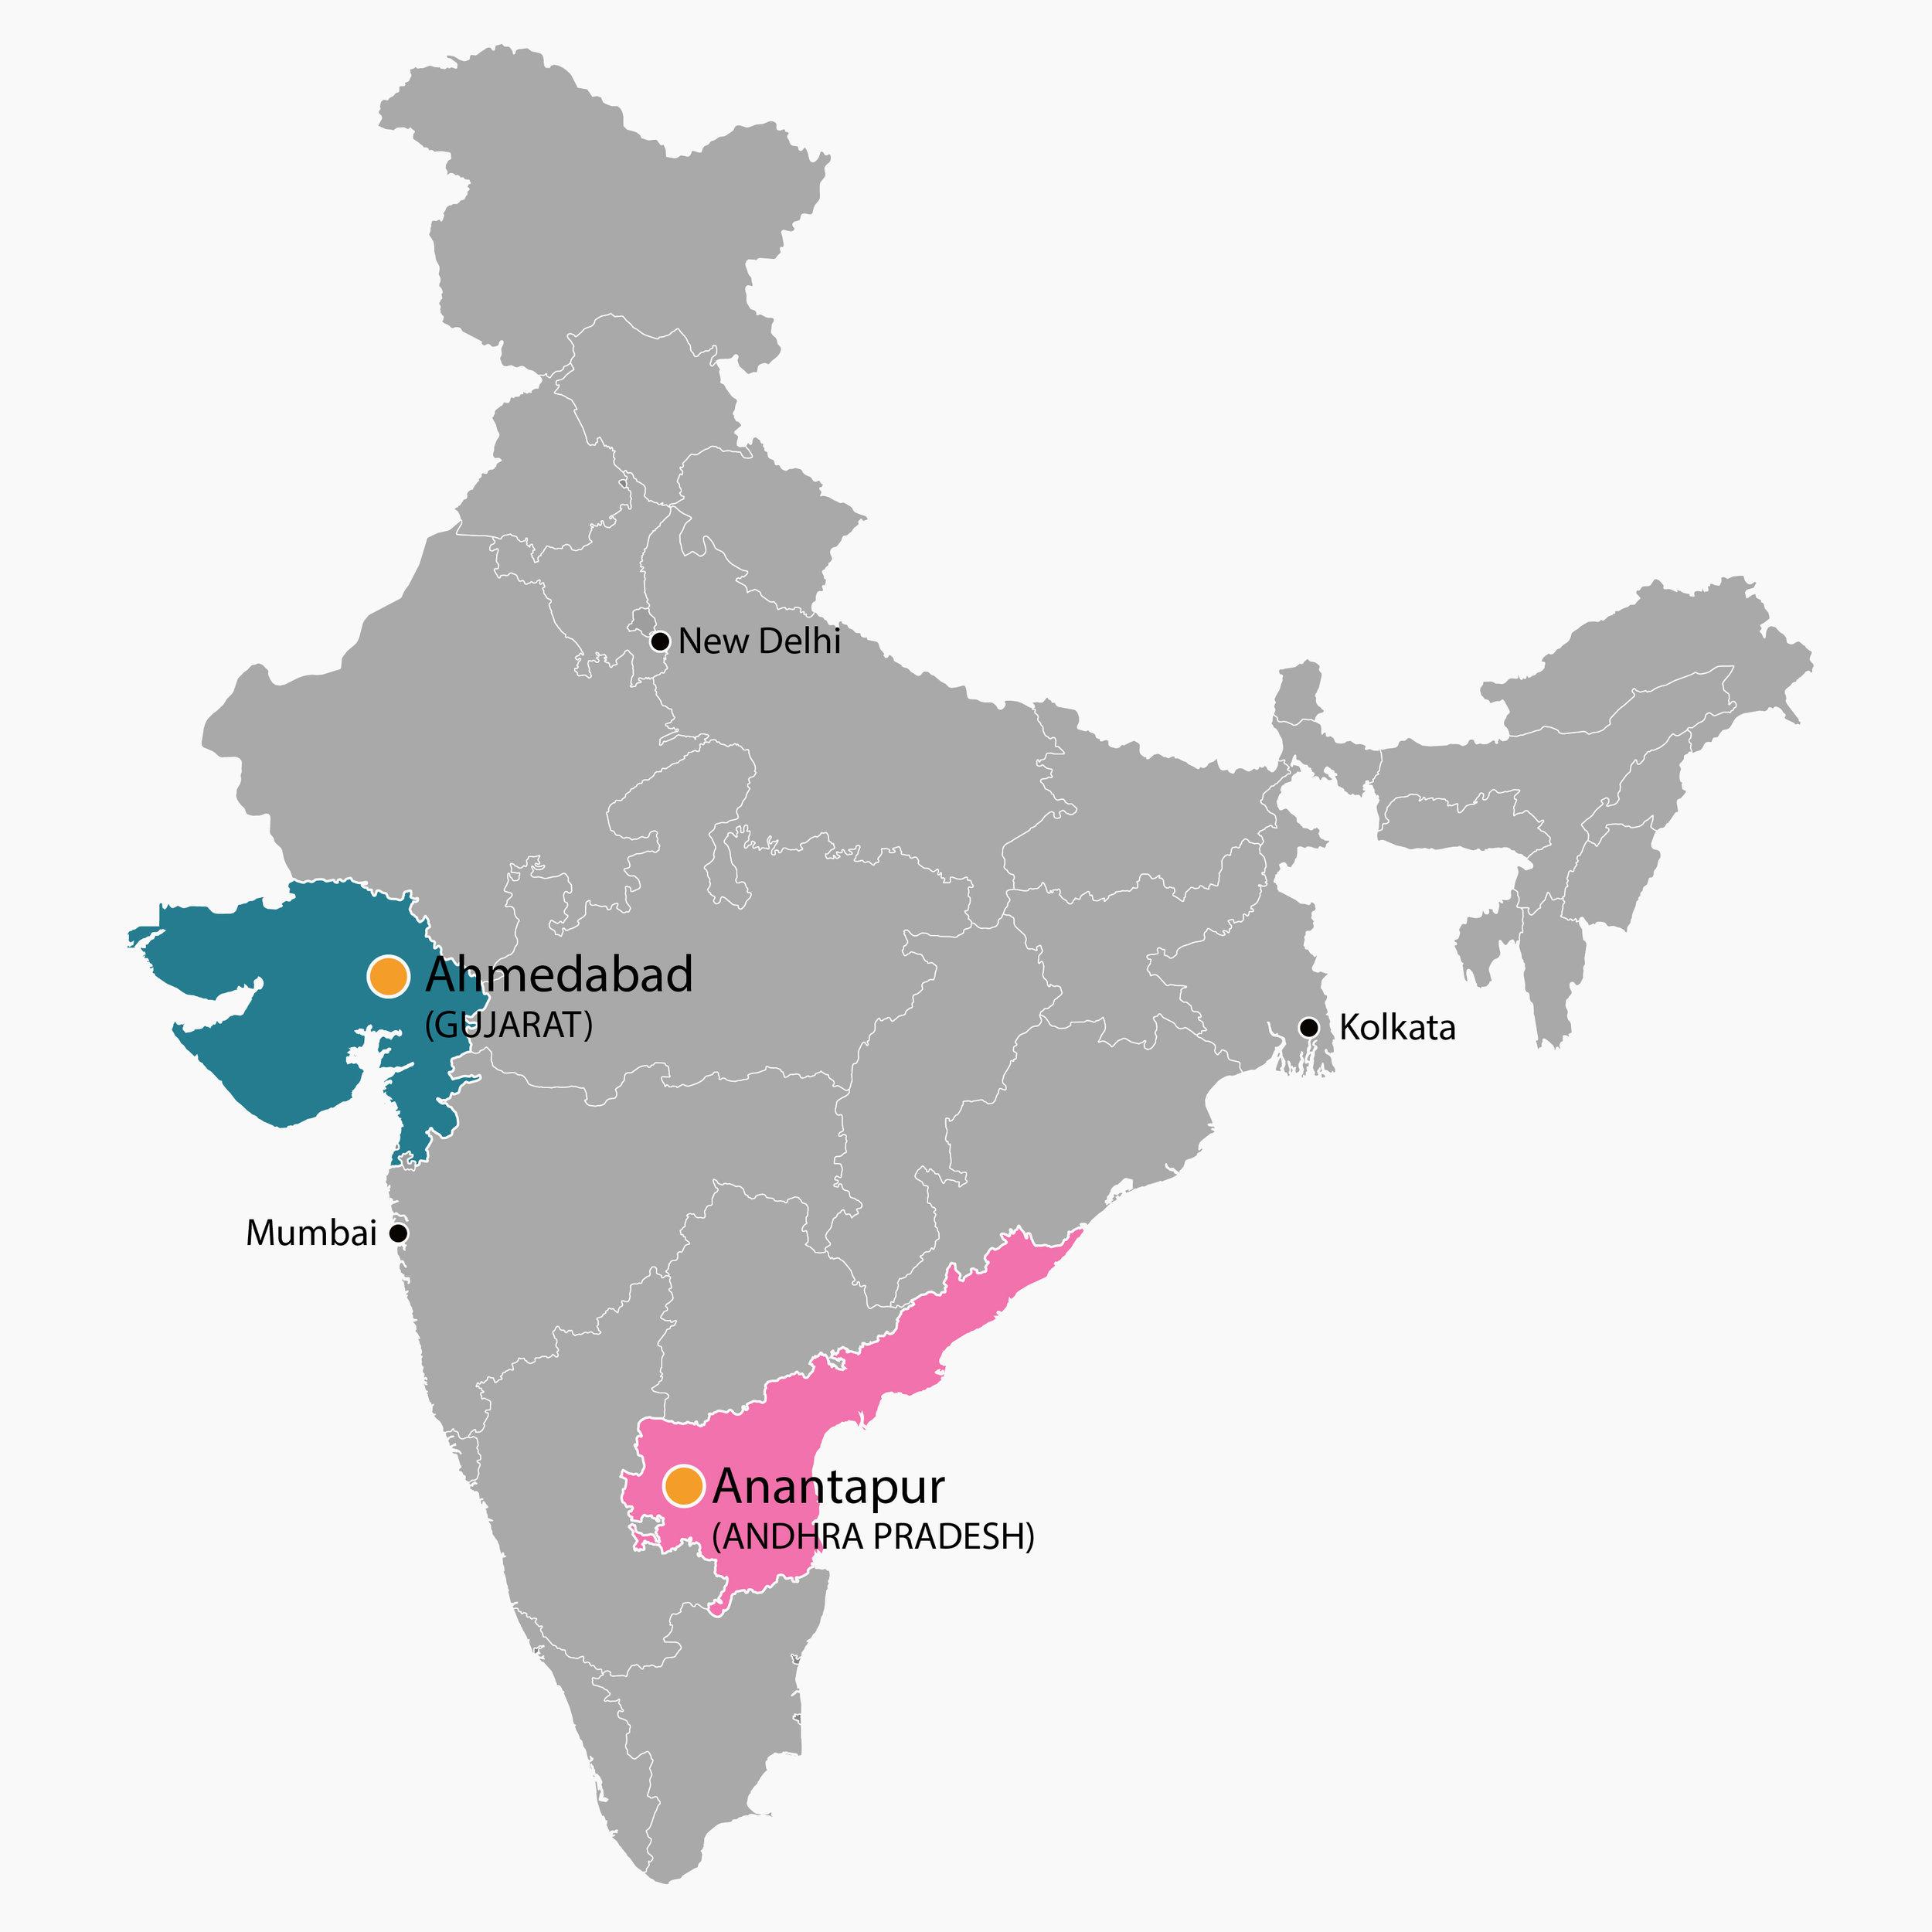 TAP_Website_India_Map.jpg